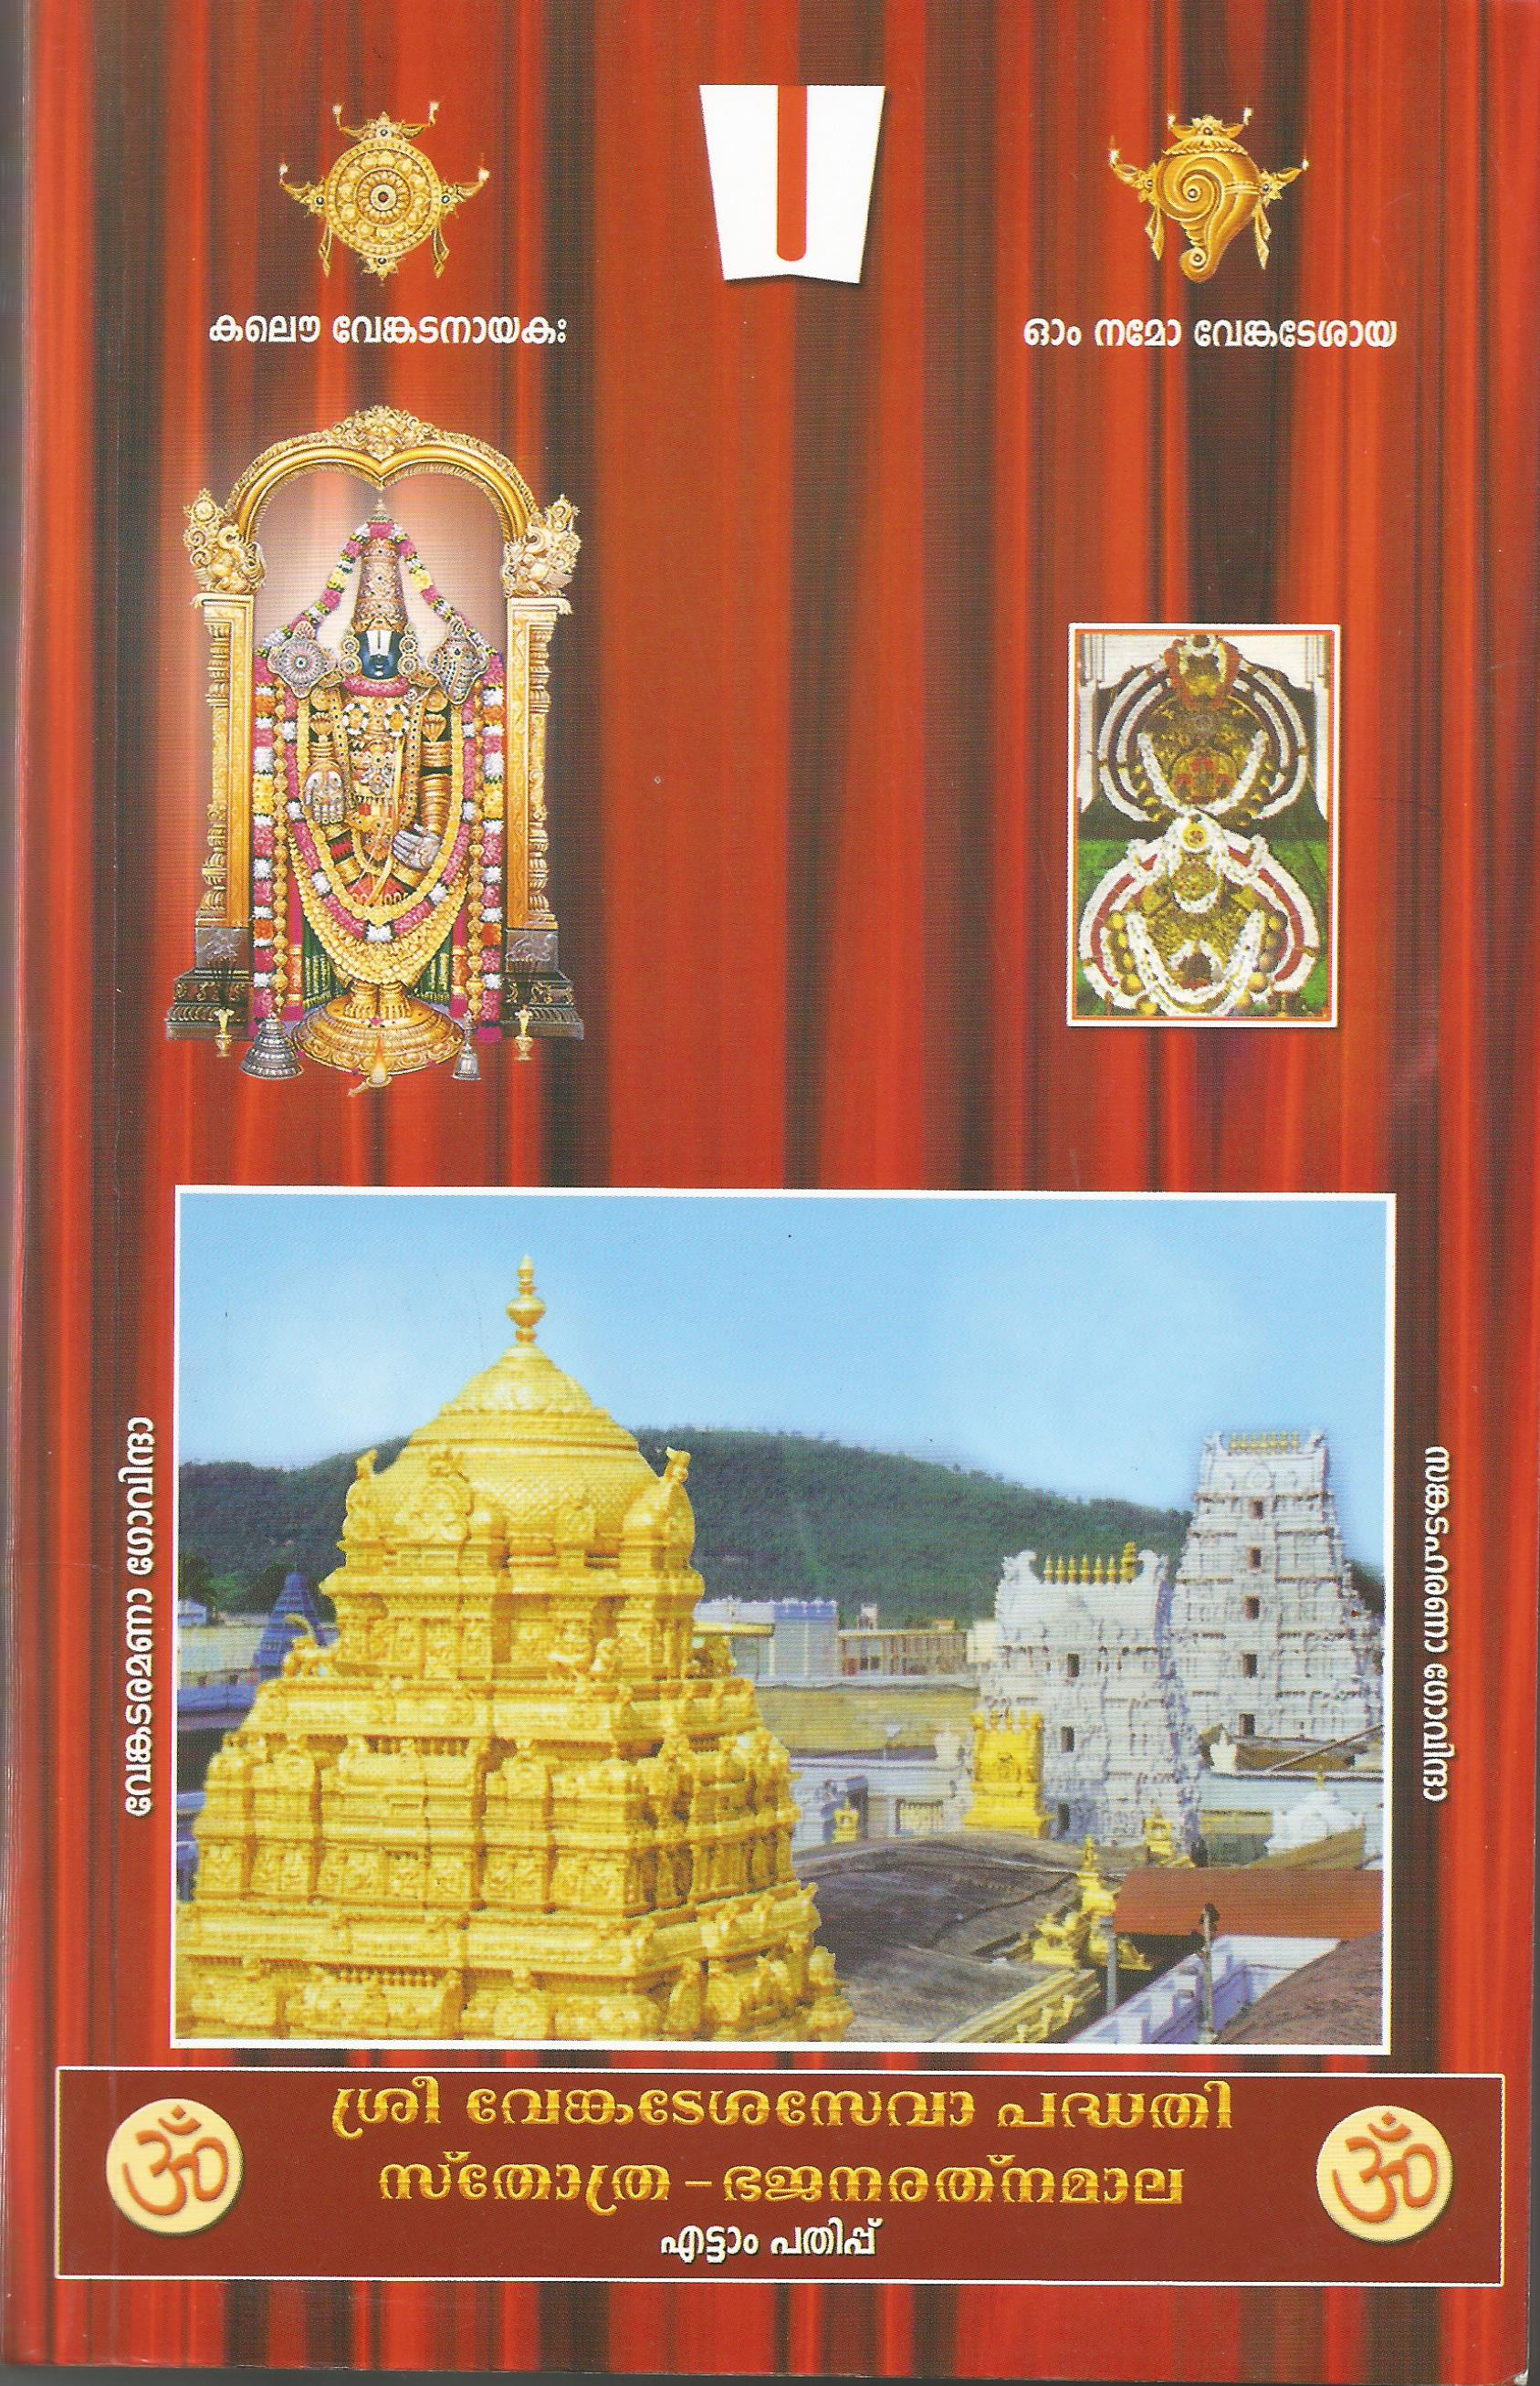 Sri Venkatesa Seva Padhathi Stotra Bhajana Ratna Mala